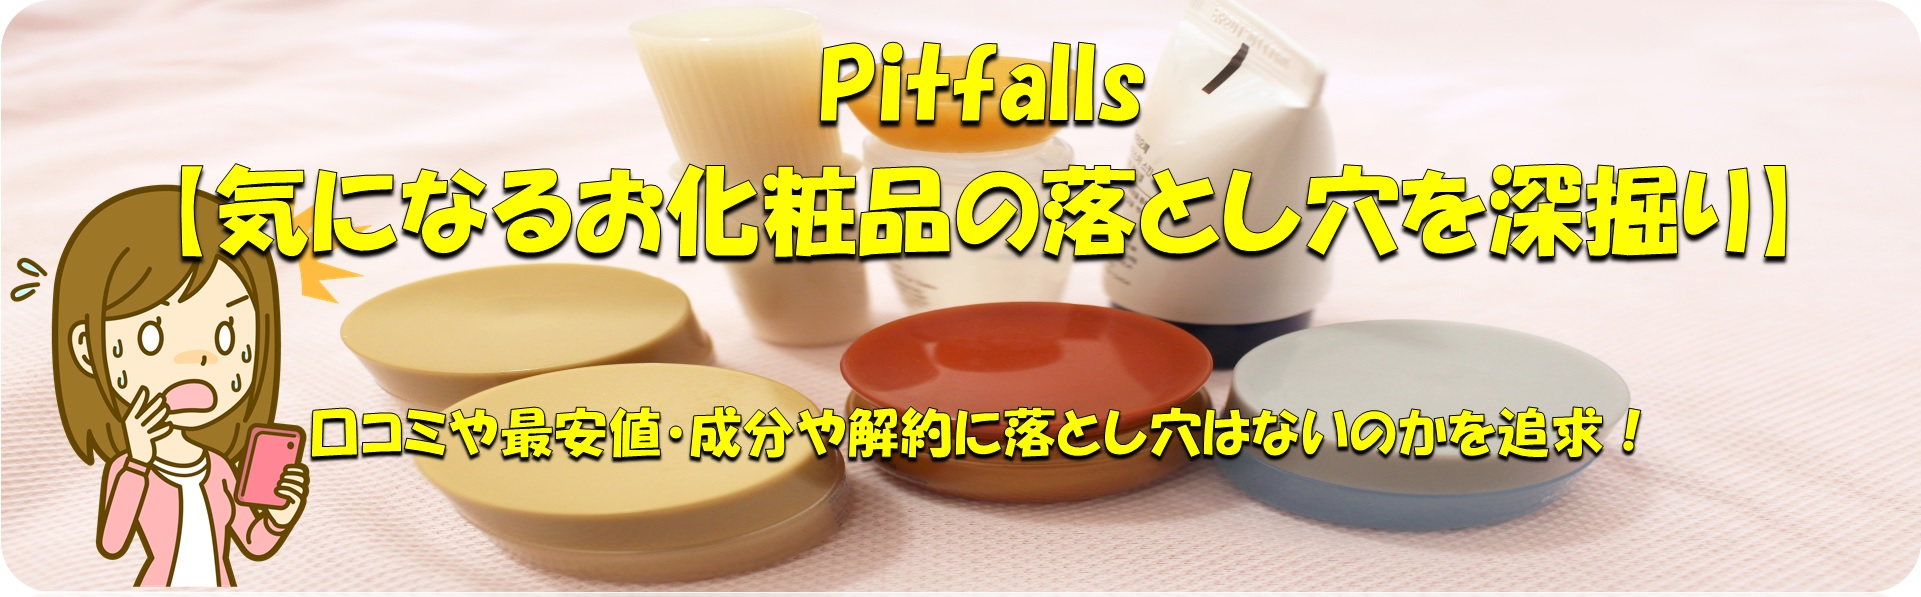 Pitfalls【気になるお化粧品の落とし穴を深掘り】